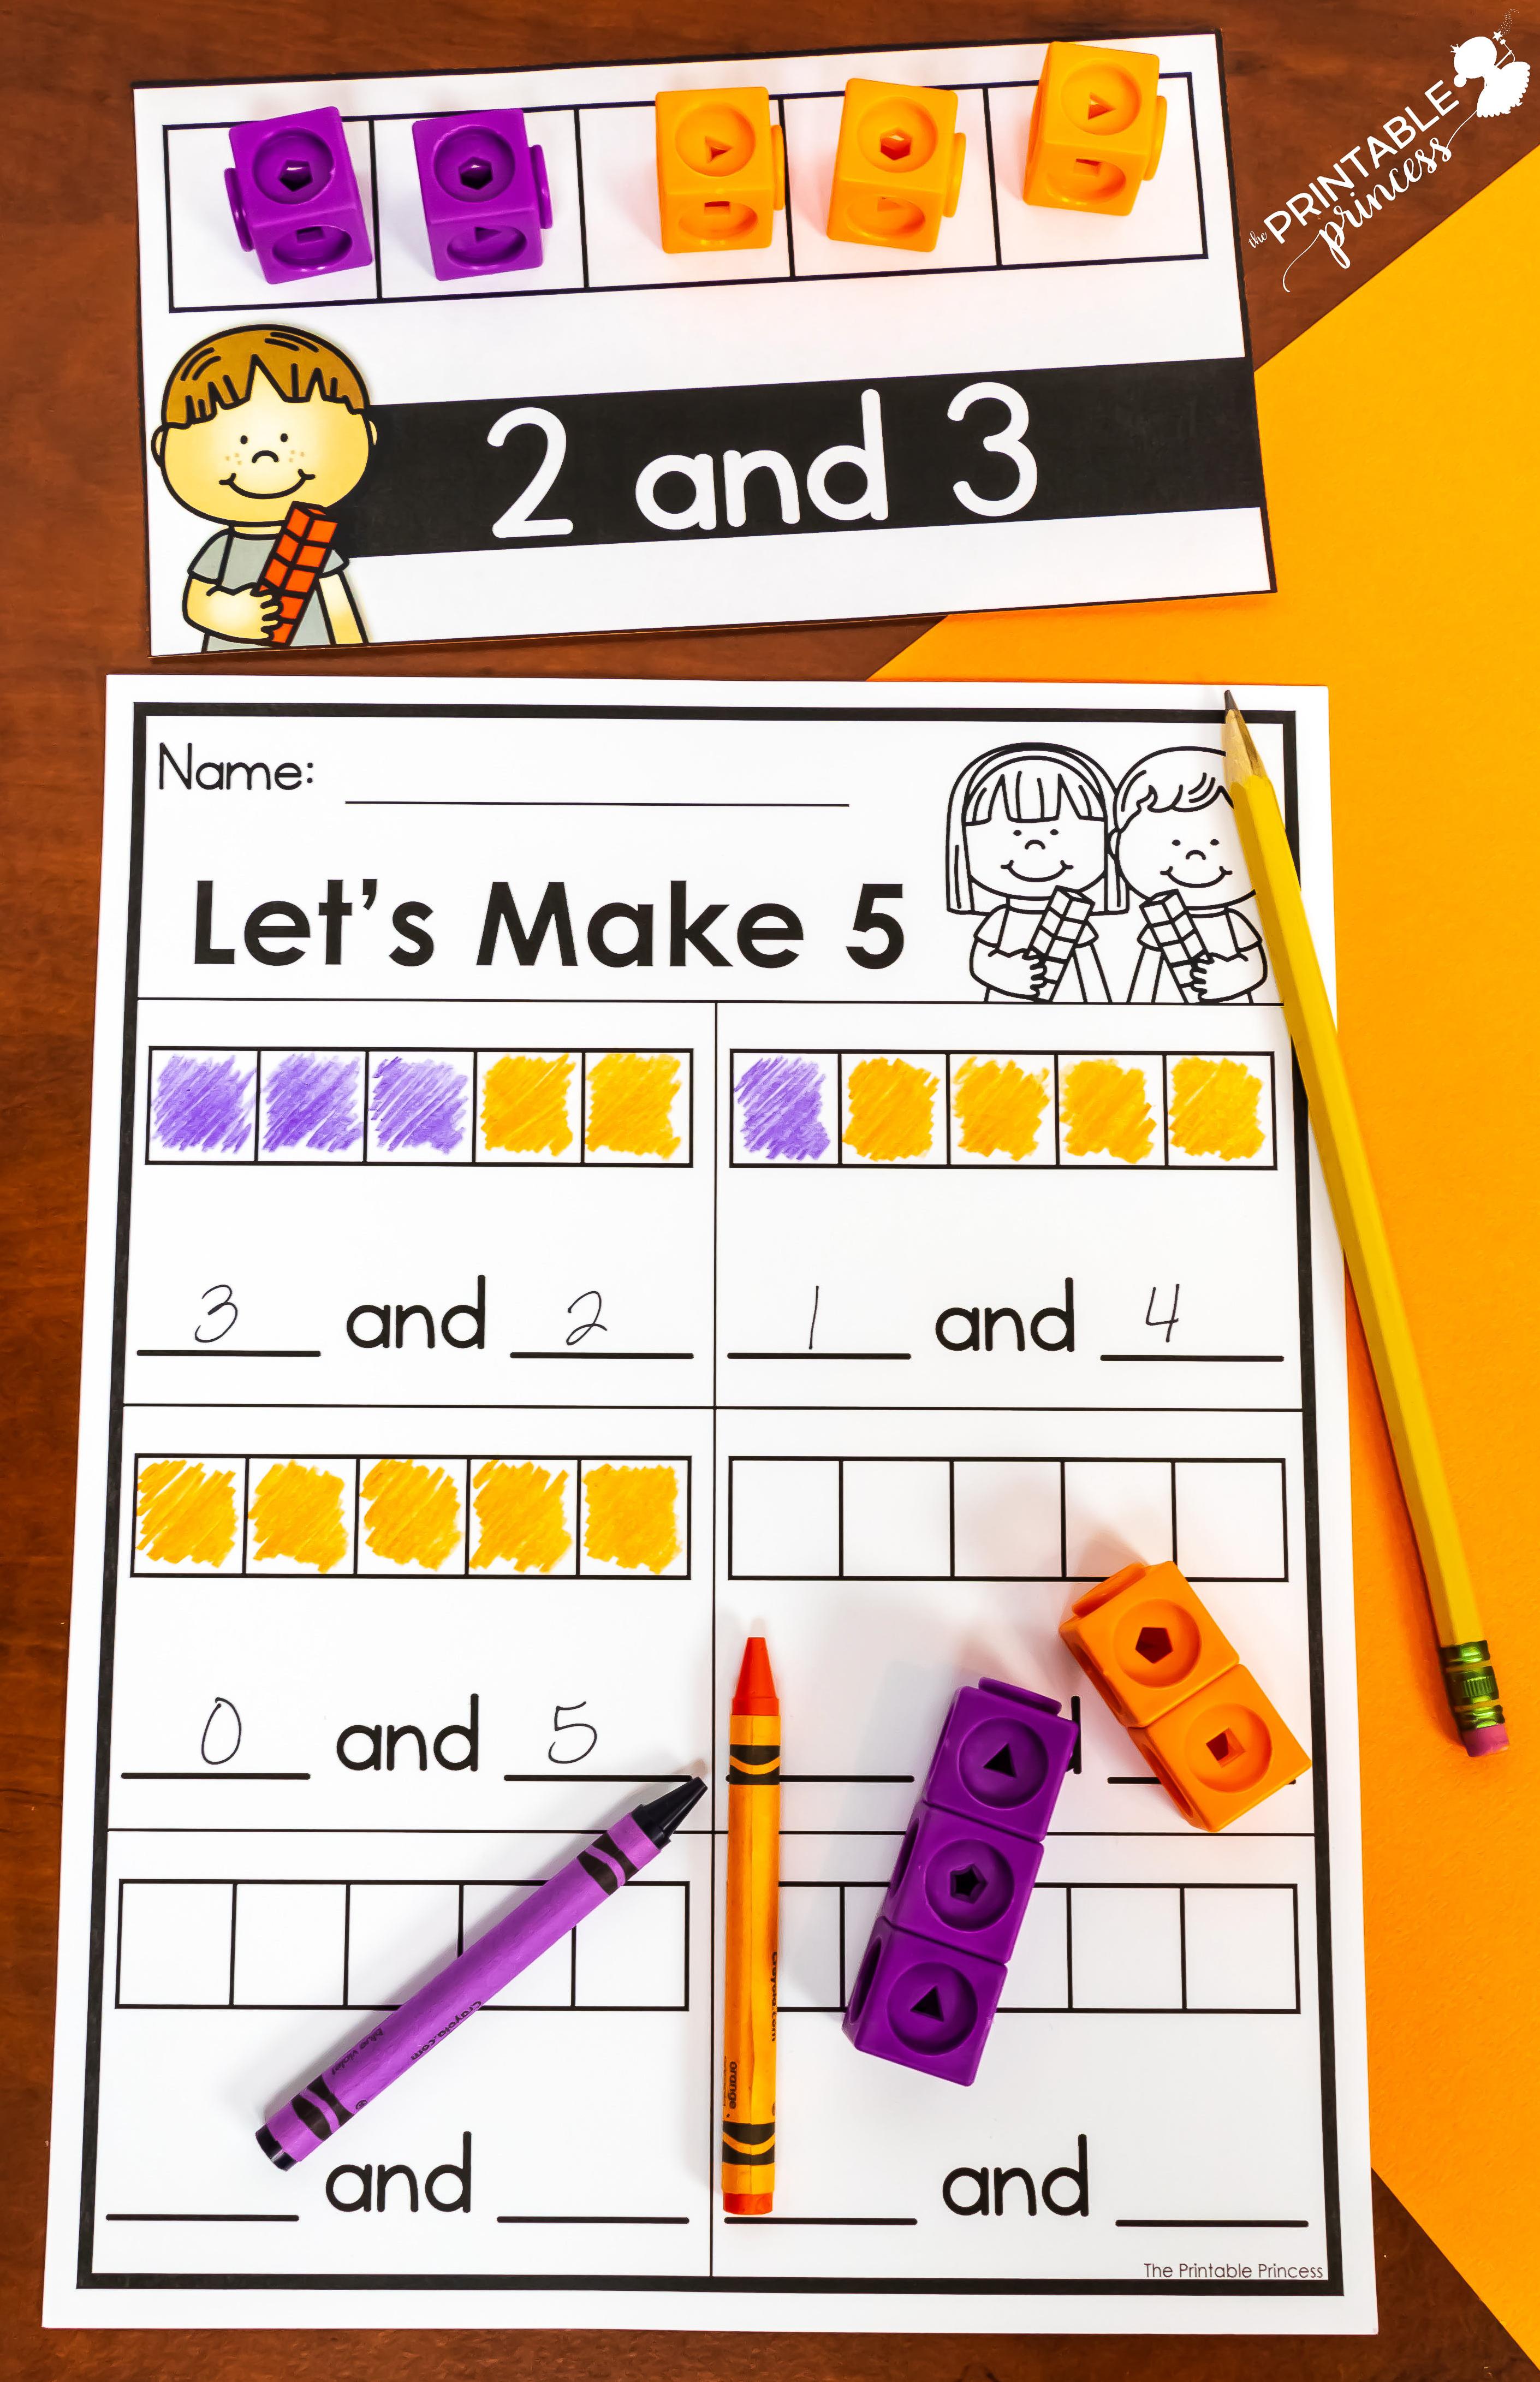 Ways To Make 5 Ways To Make 10 Bundle Kindergarten Math Activities Kindergarten Math Games Math Activities [ 4363 x 2821 Pixel ]